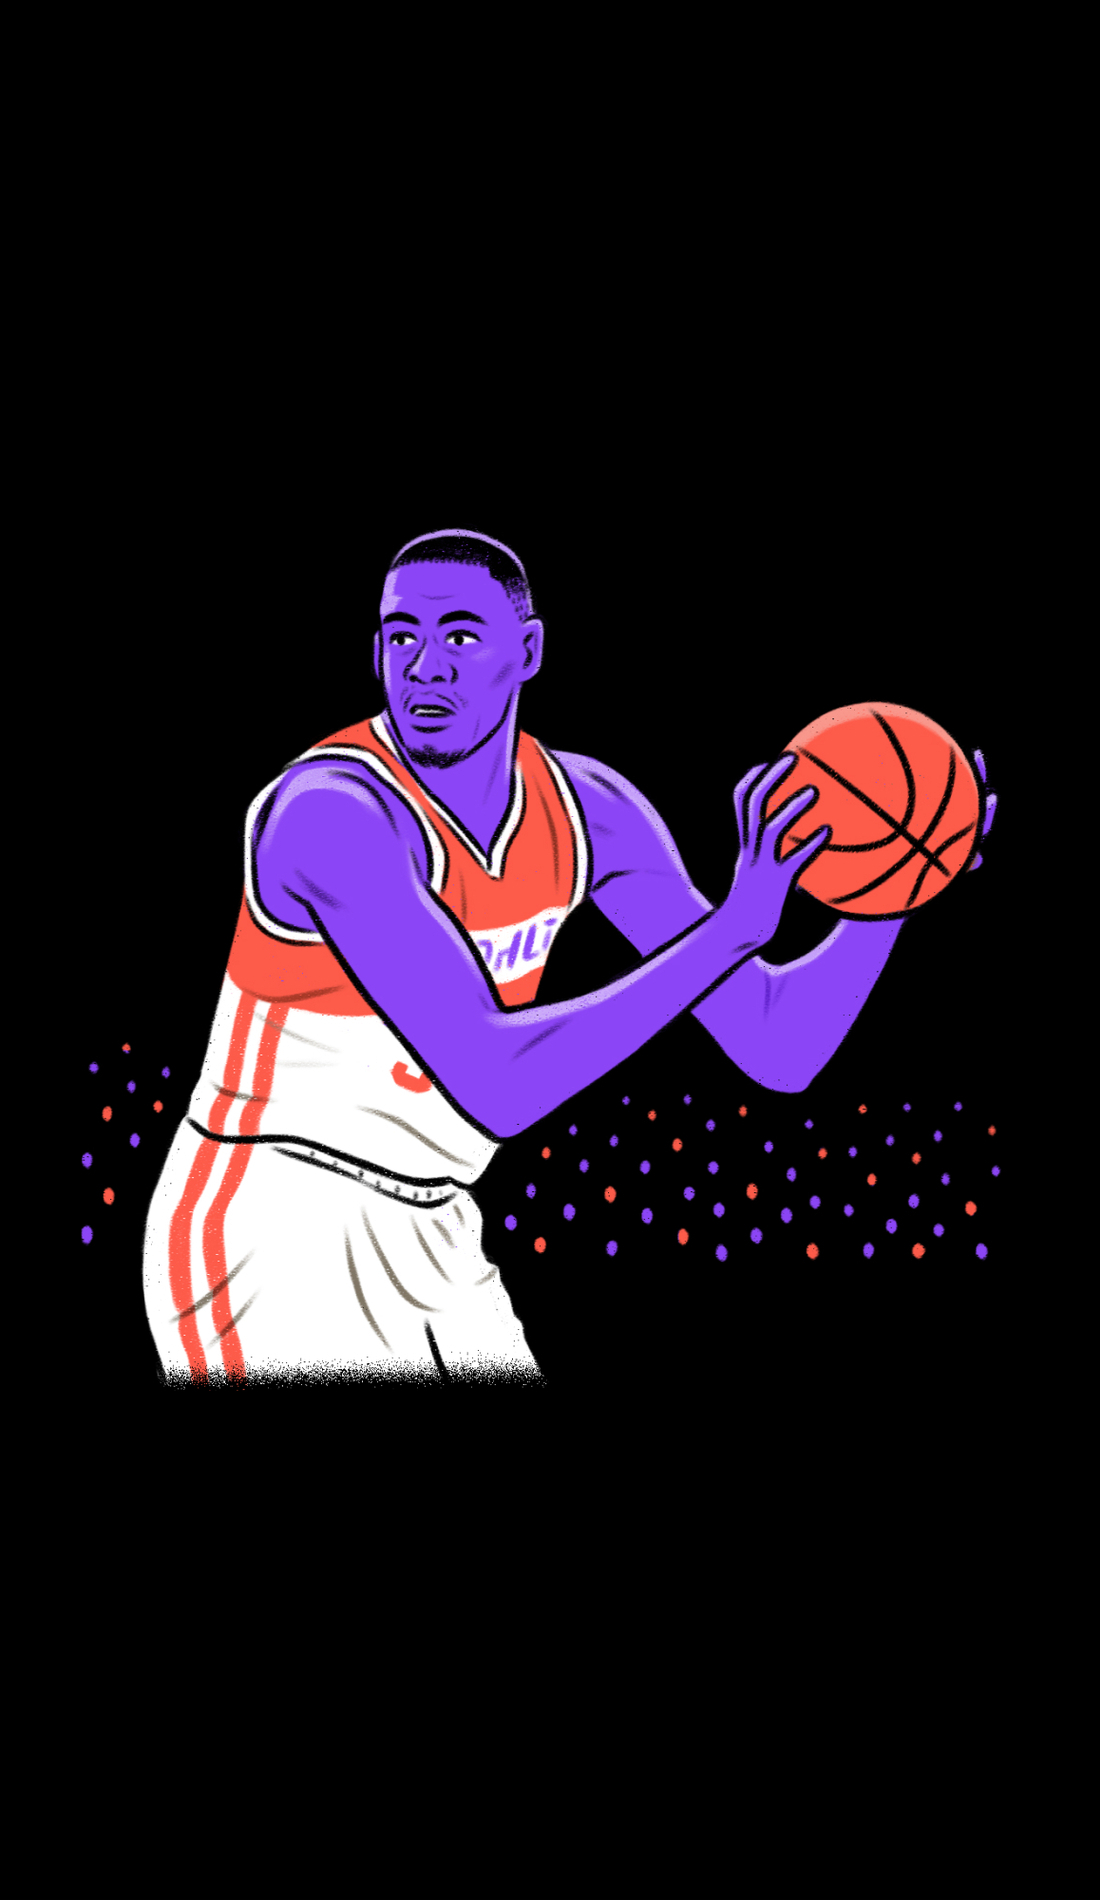 A Northwestern Wildcats Basketball live event